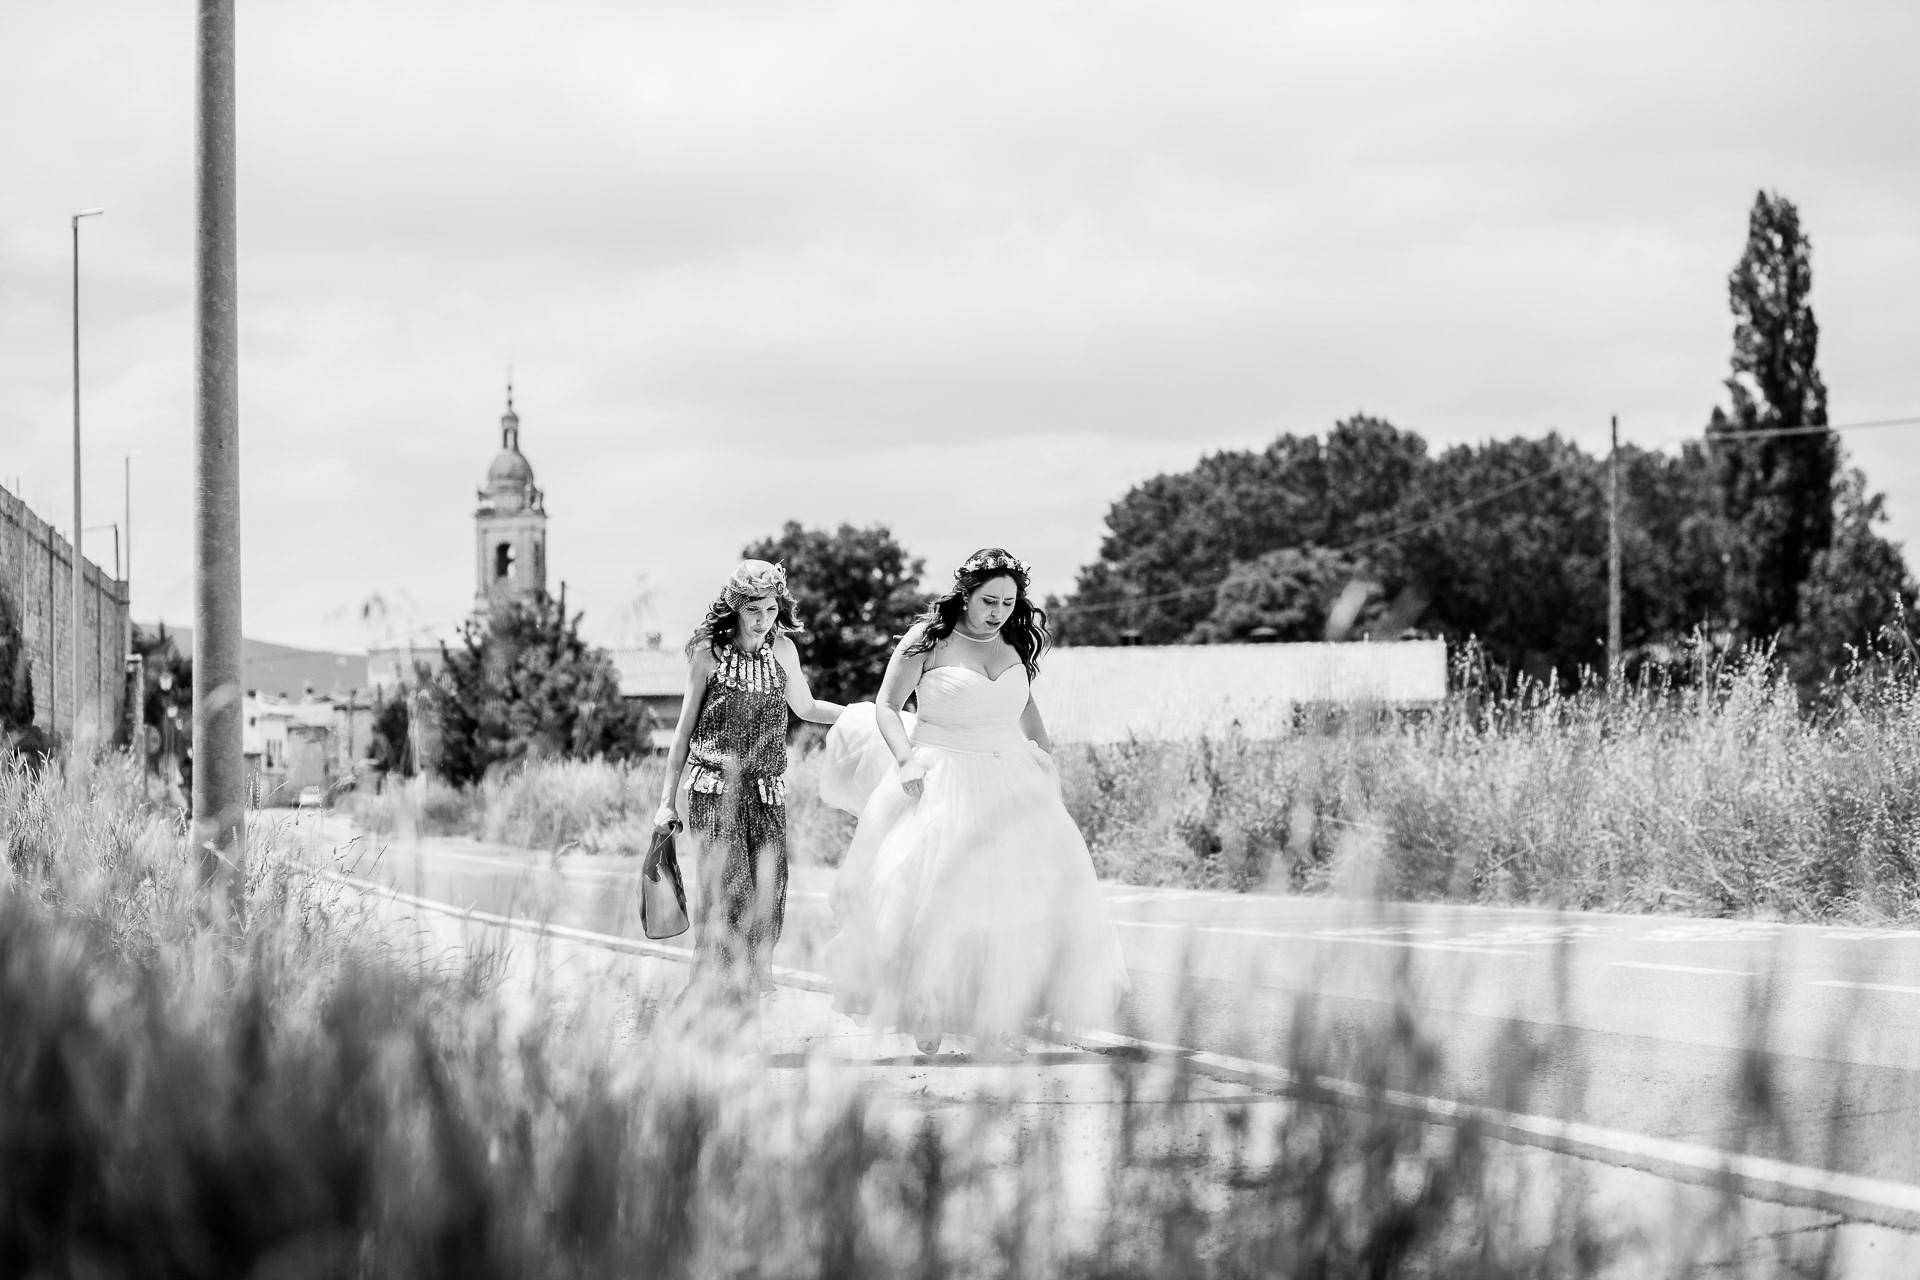 boda civil restaurante lola 135623